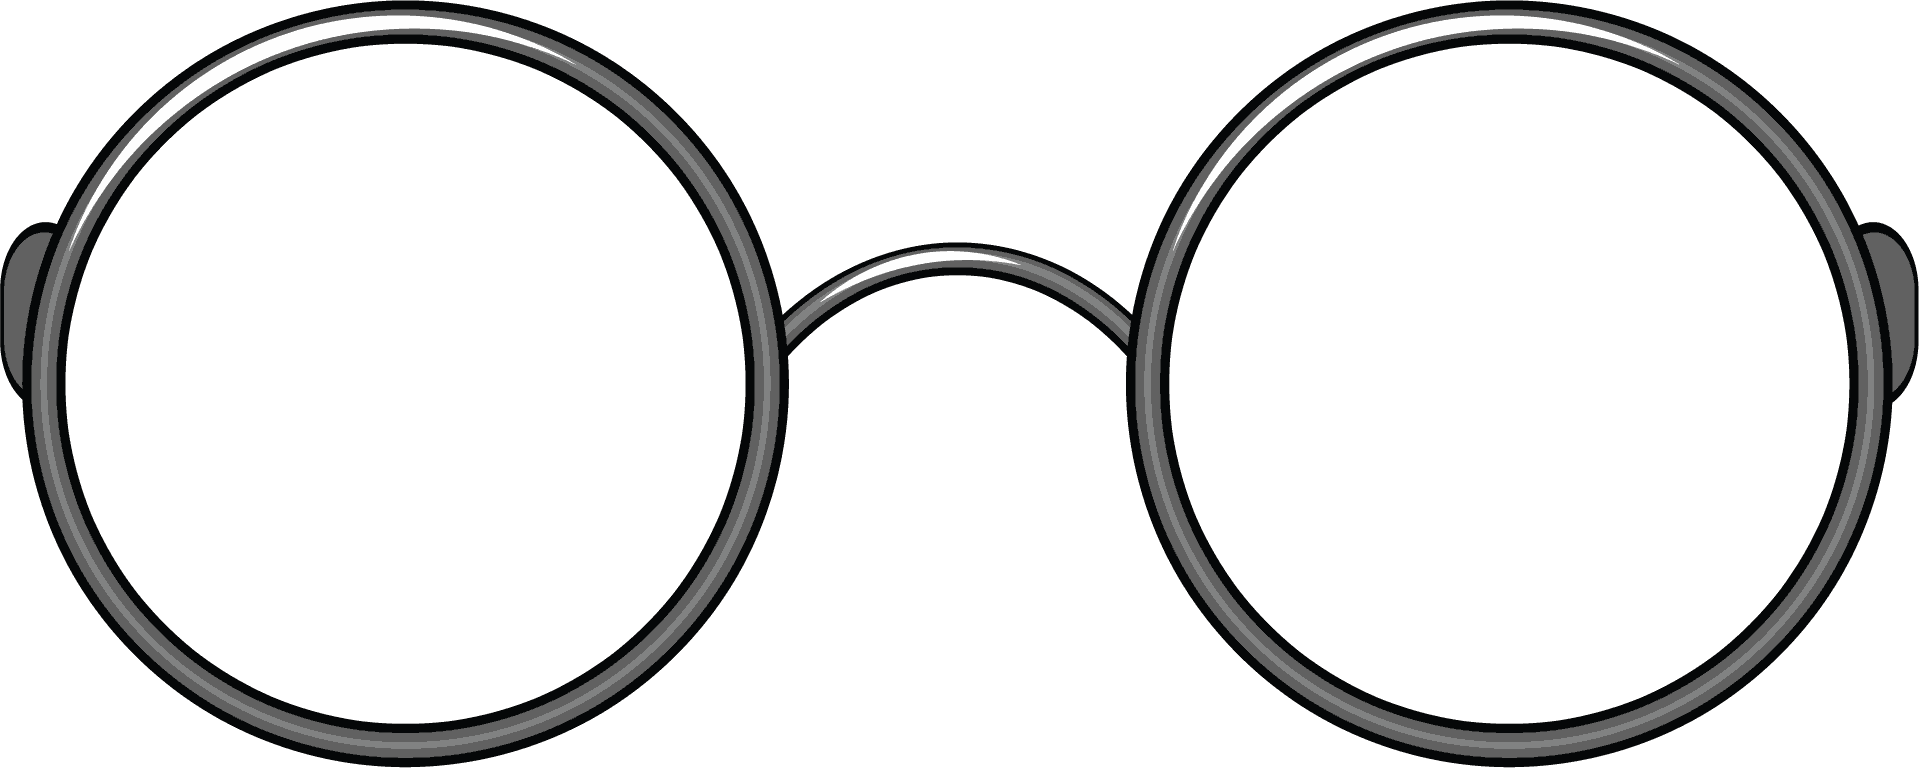 Round sun clipart black and white jpg Sunglasses Clipart Black And White | Clipart Panda - Free Clipart Images jpg